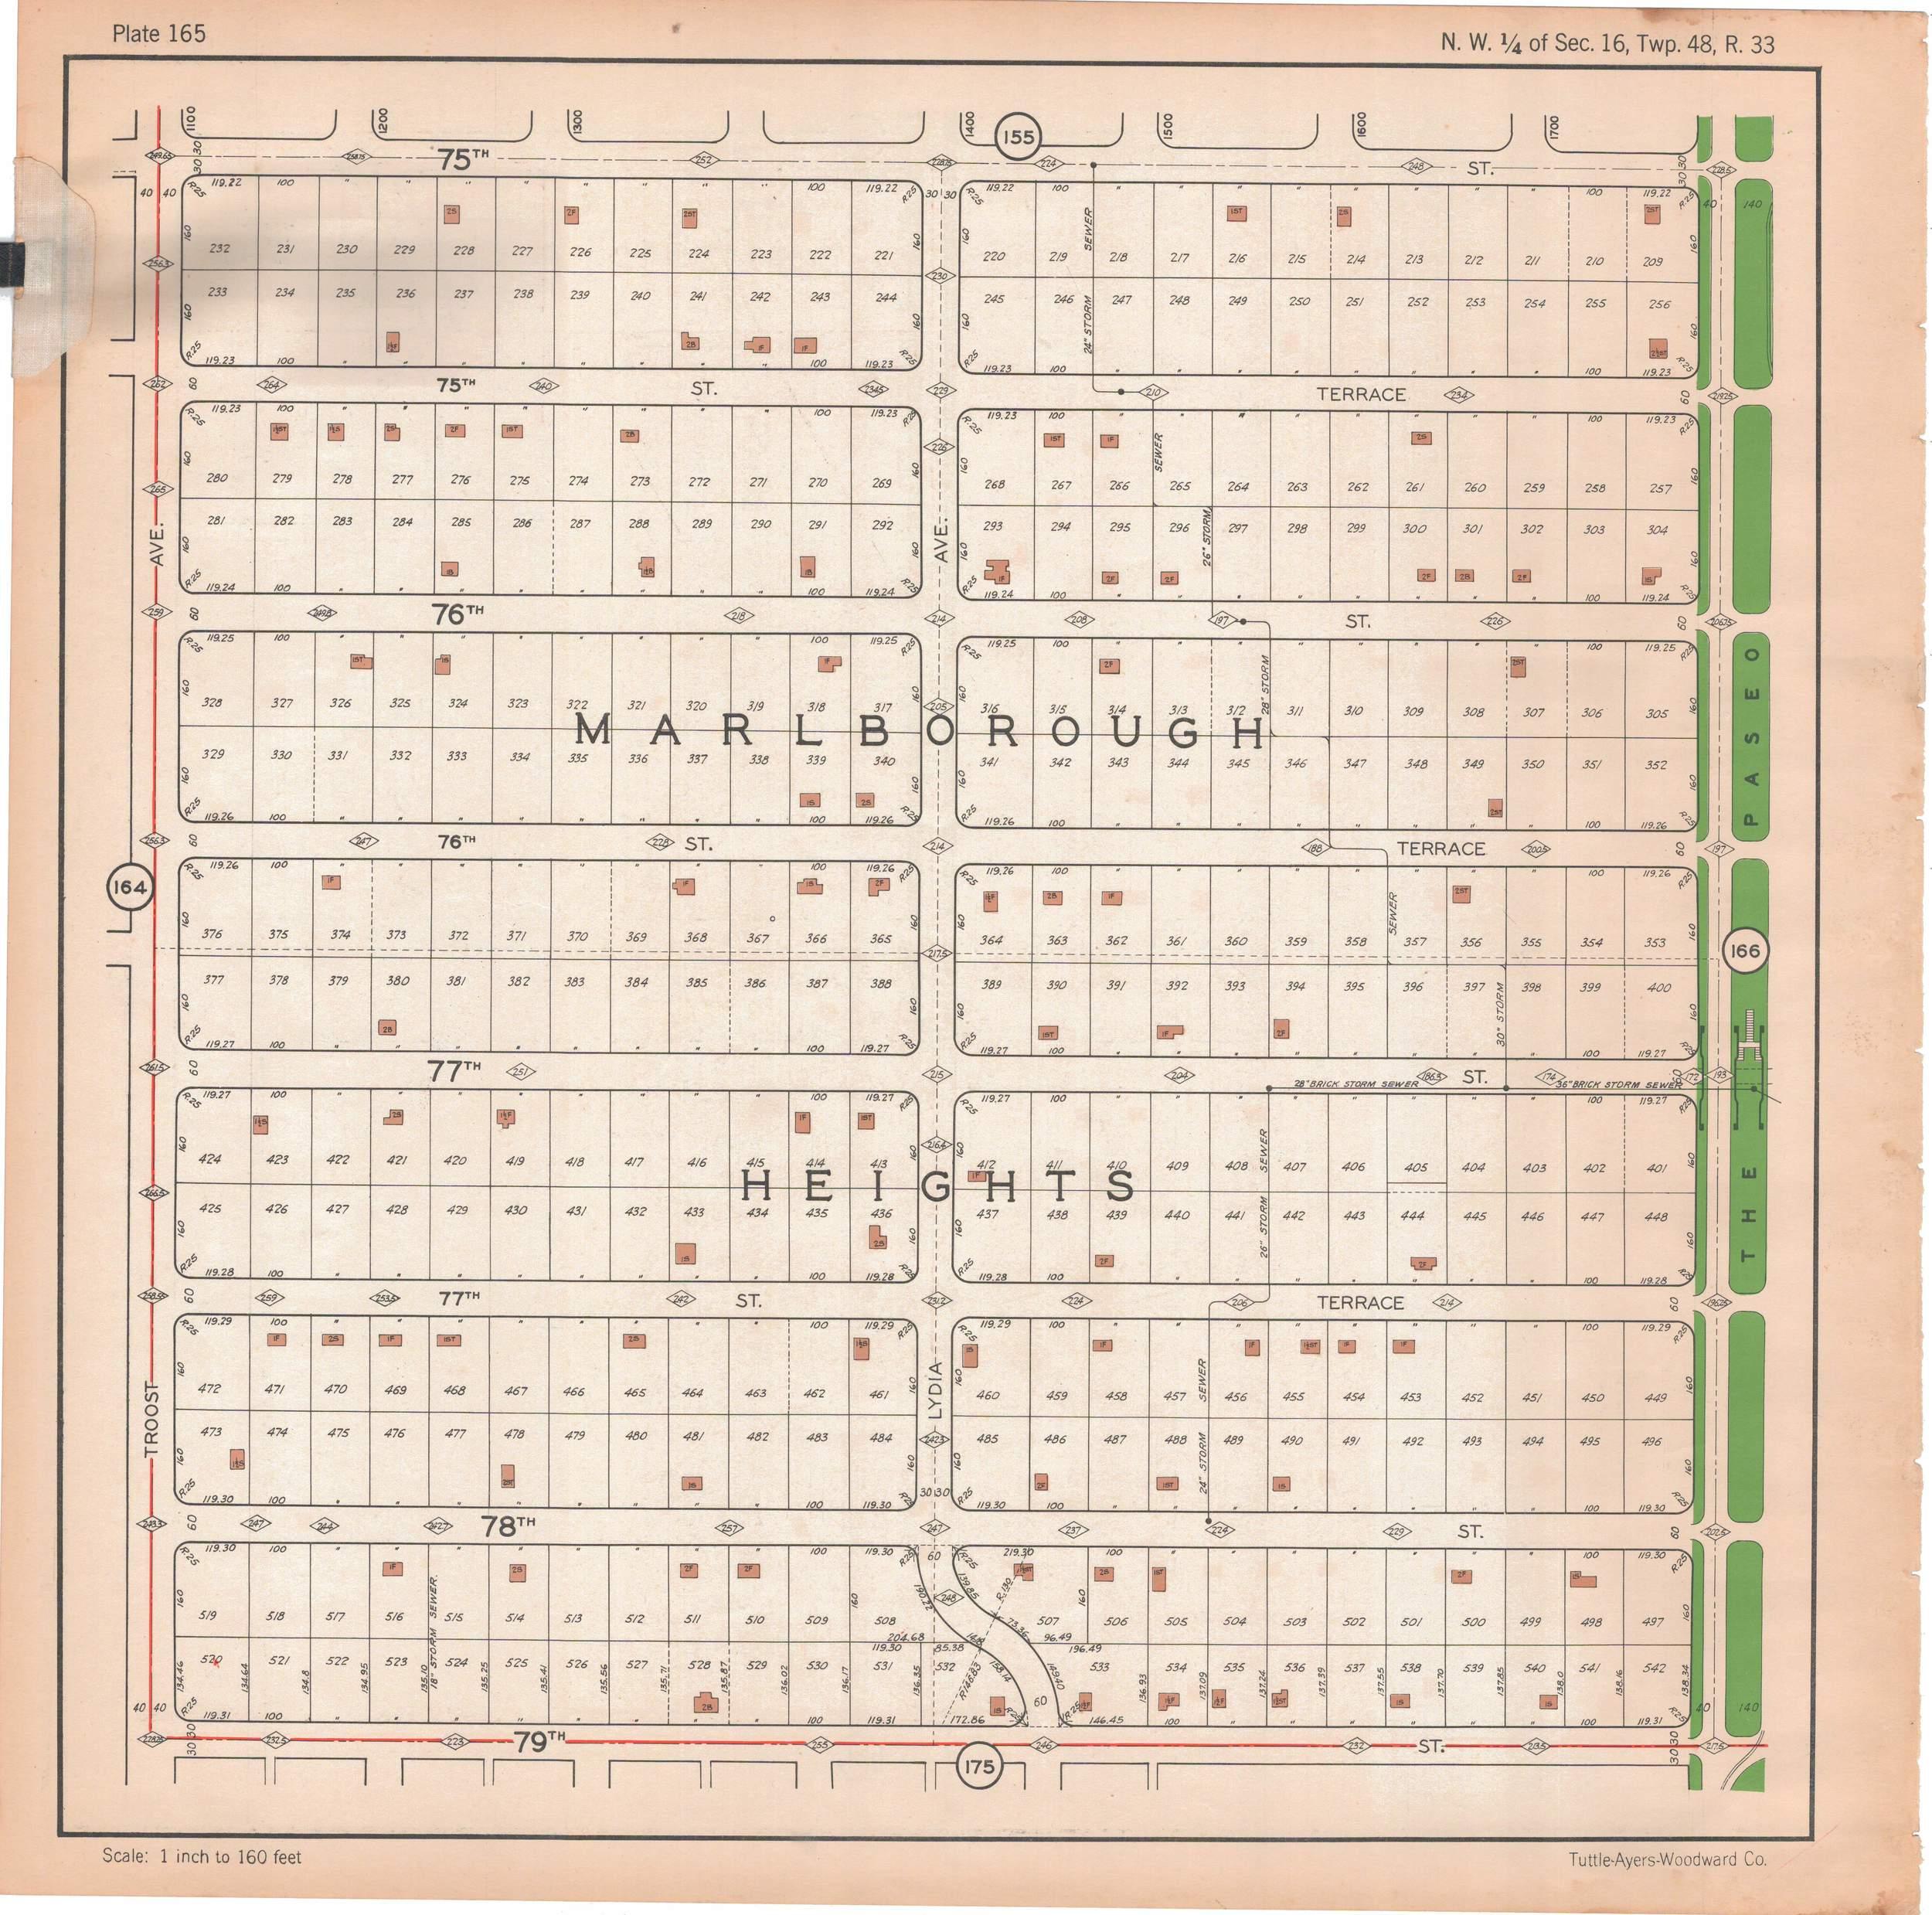 1925 TUTTLE_AYERS_Plate_165.JPG